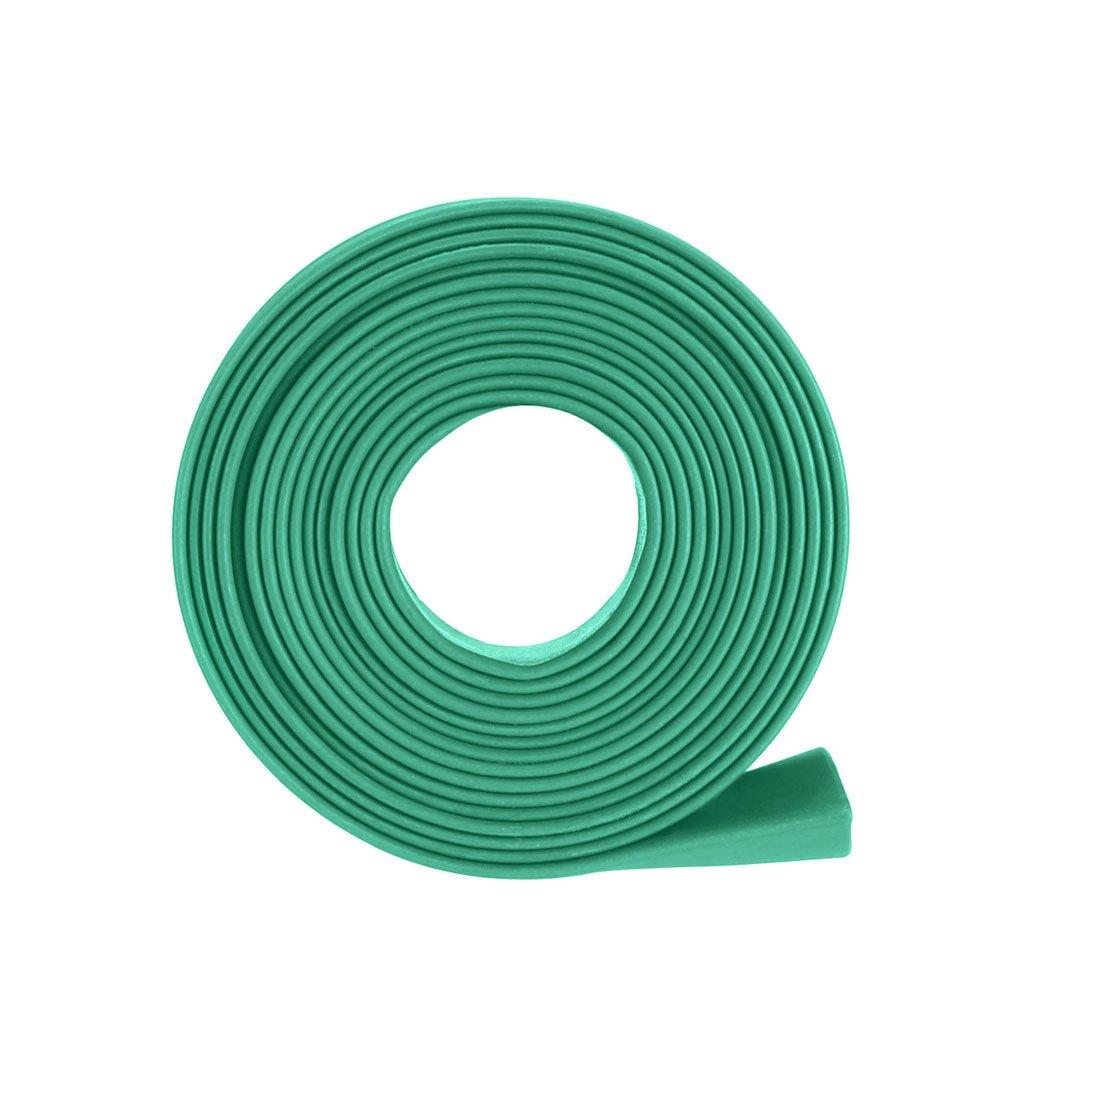 Sourcingmap Tubo termorretr/áctil 2:1 Tubo de aislamiento el/éctrico Cable Tubo de manguera Envoltura Verde 15 mm Di/ámetro 1 m Longitud